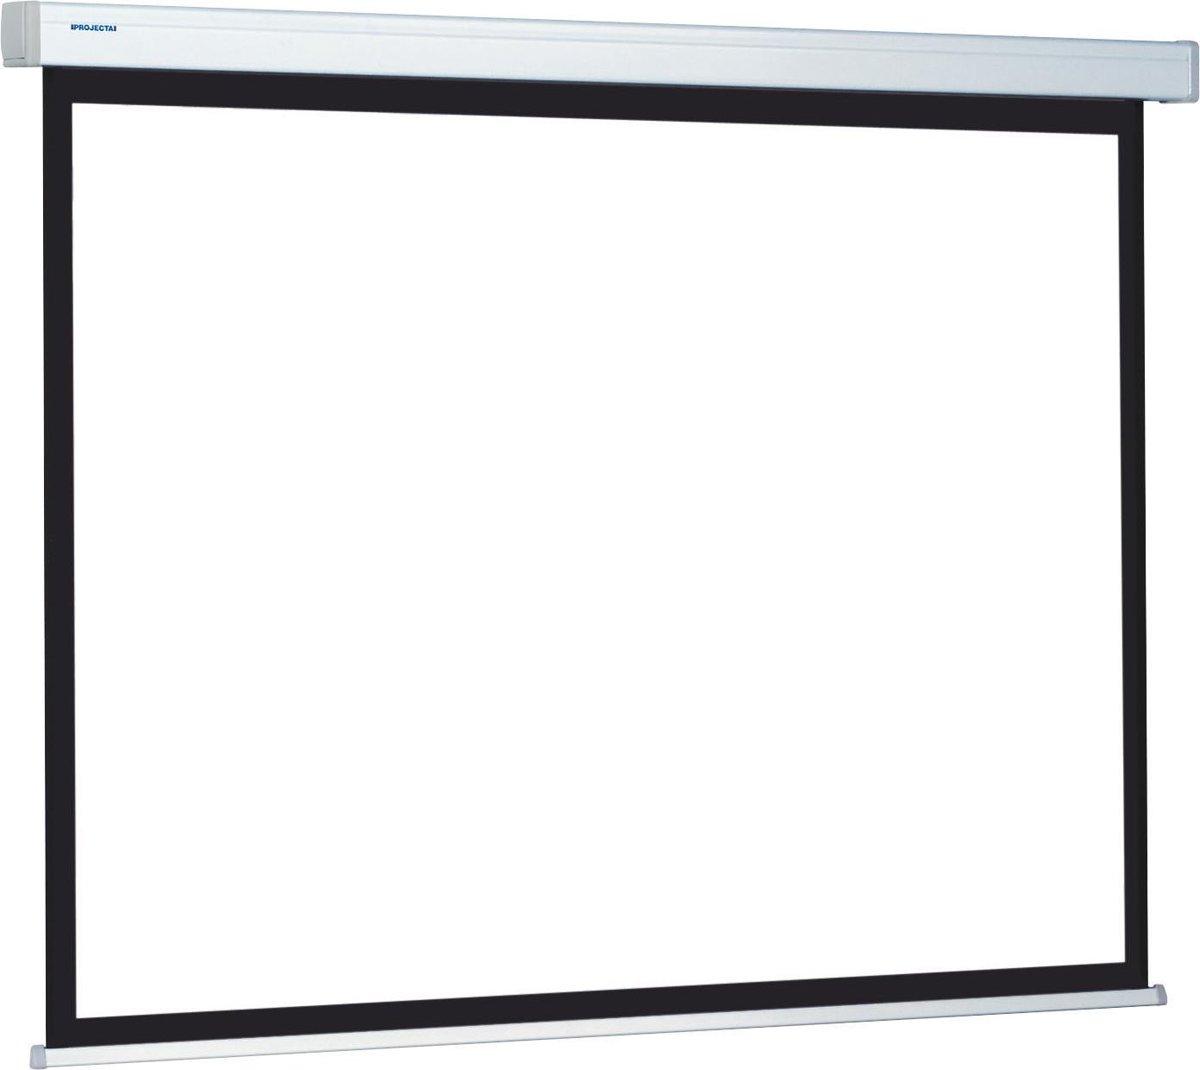 Milestone ProScreen CSR 200x200 1:1 Blanc mat 10240202 kopen